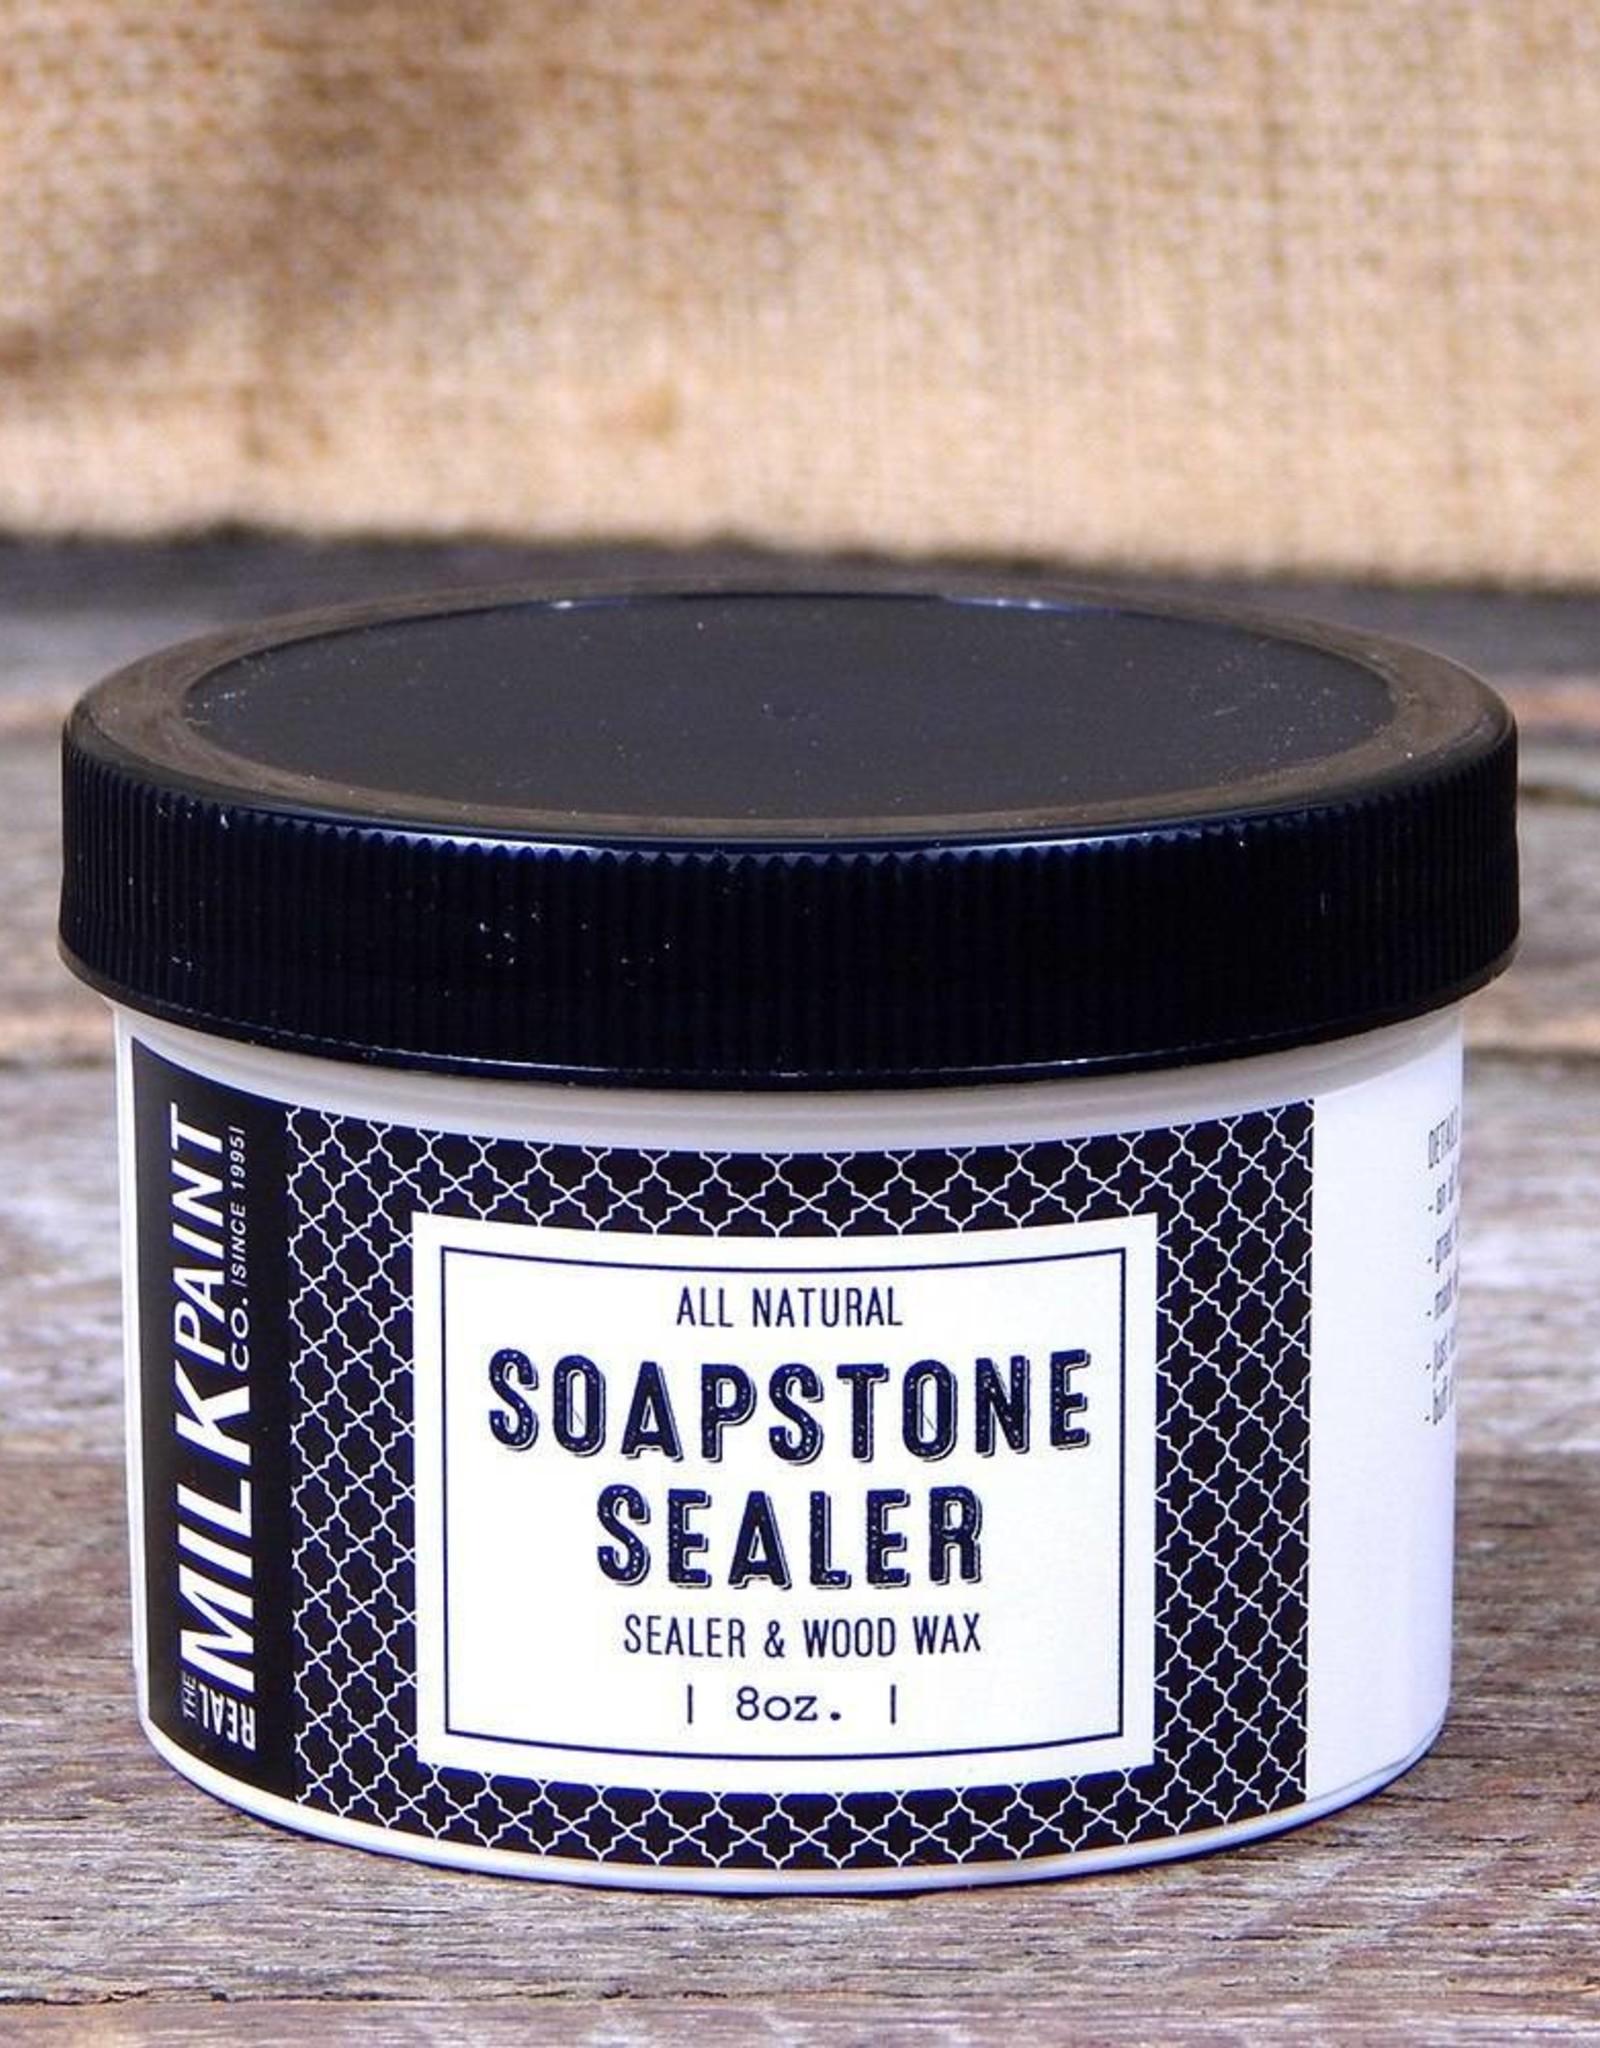 Soapstone & Wood Wax